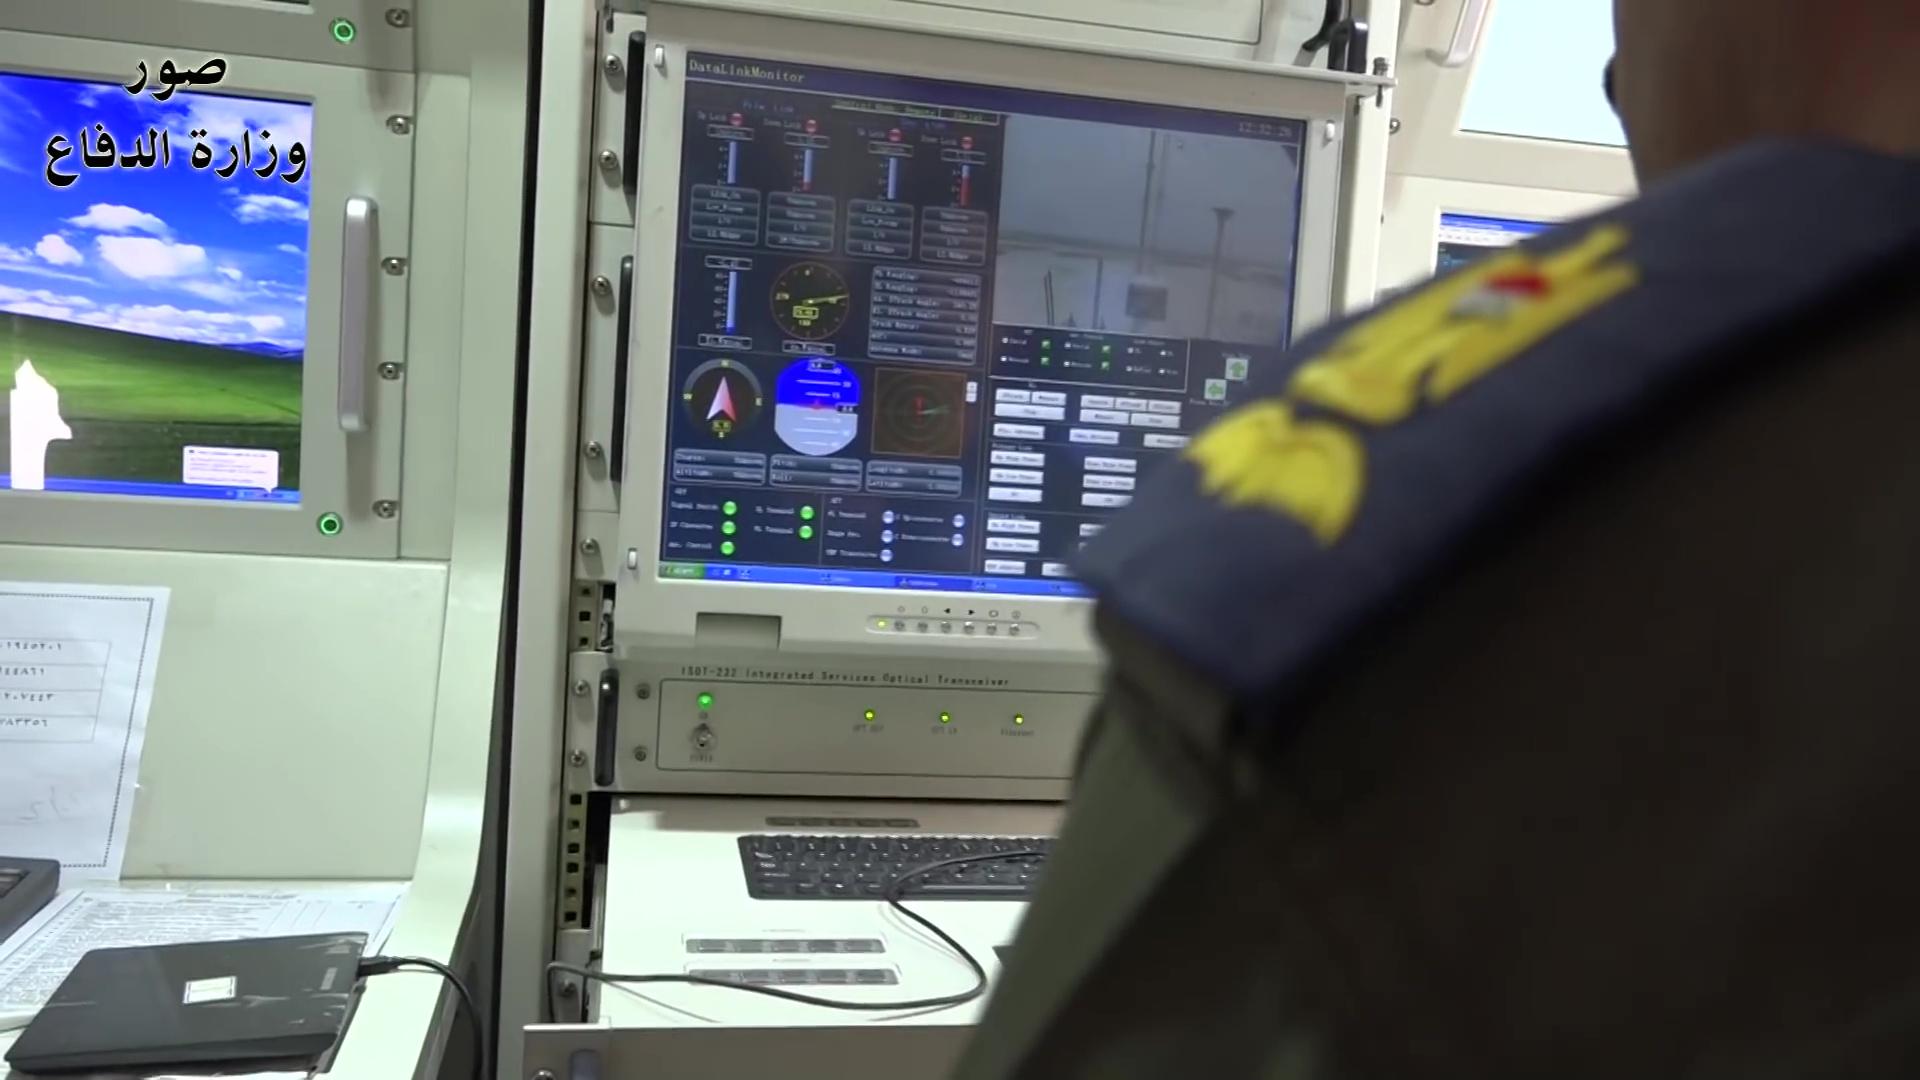 مسابقة رمضان الطائرات دون طيار  2018-02-18-Les-officiers-irakiens-parlent-du-drone-CH-4-15